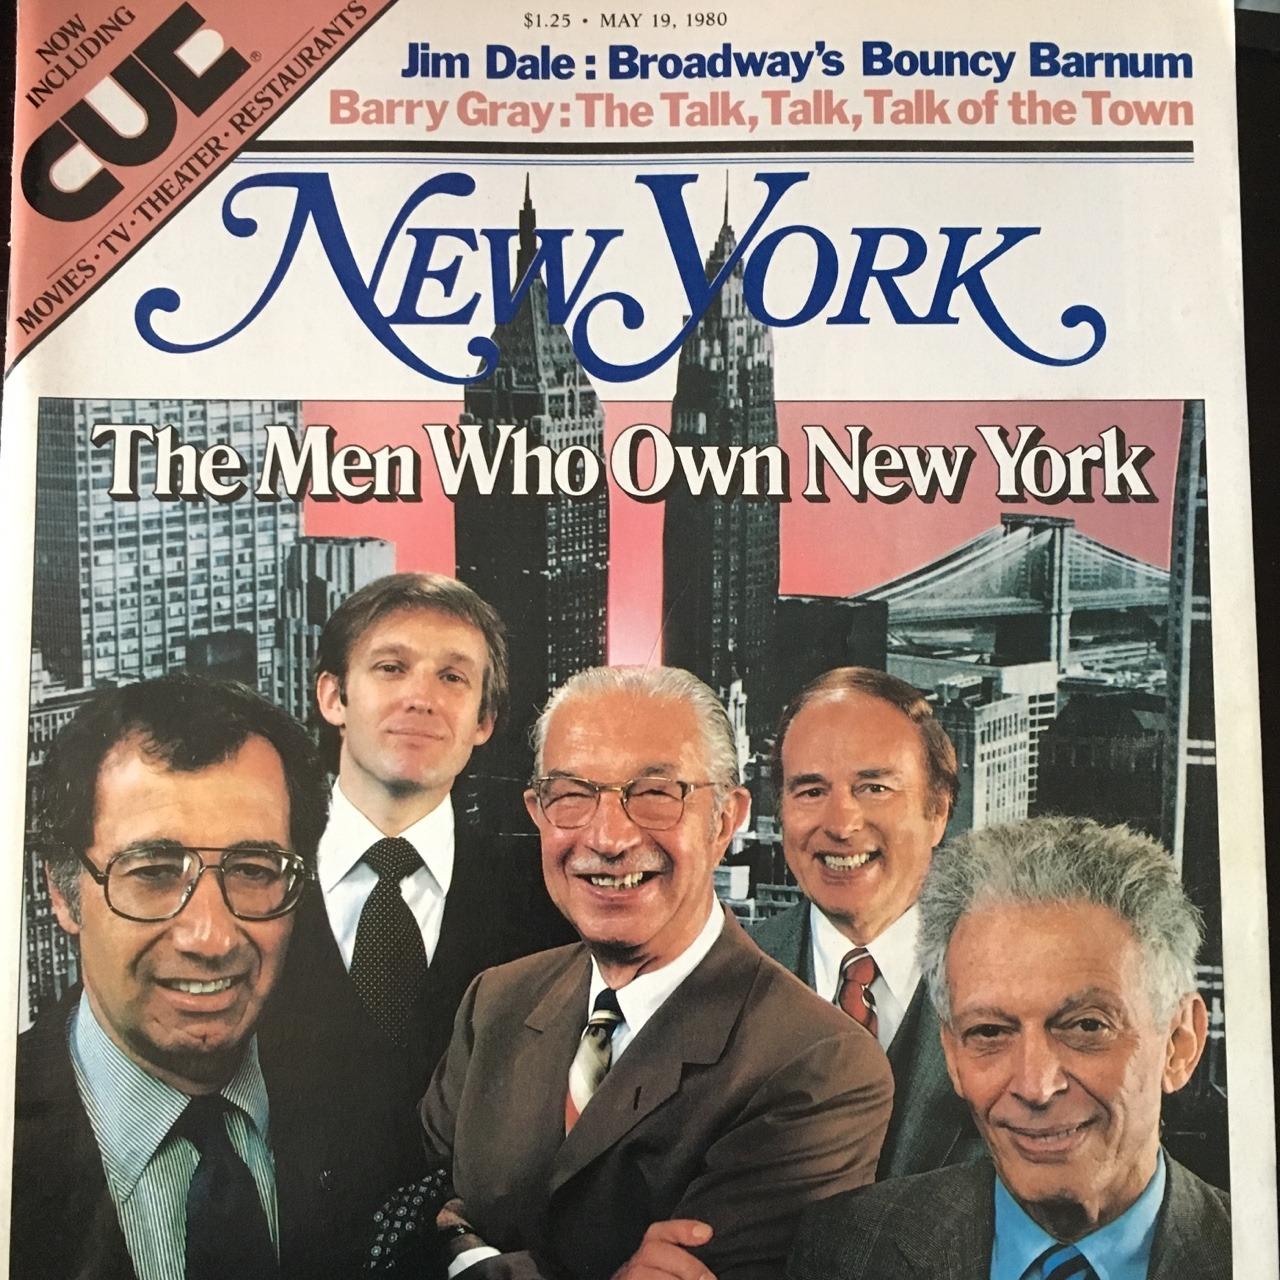 The Men Who Own New York. New York Magazine. May 19, 1980.